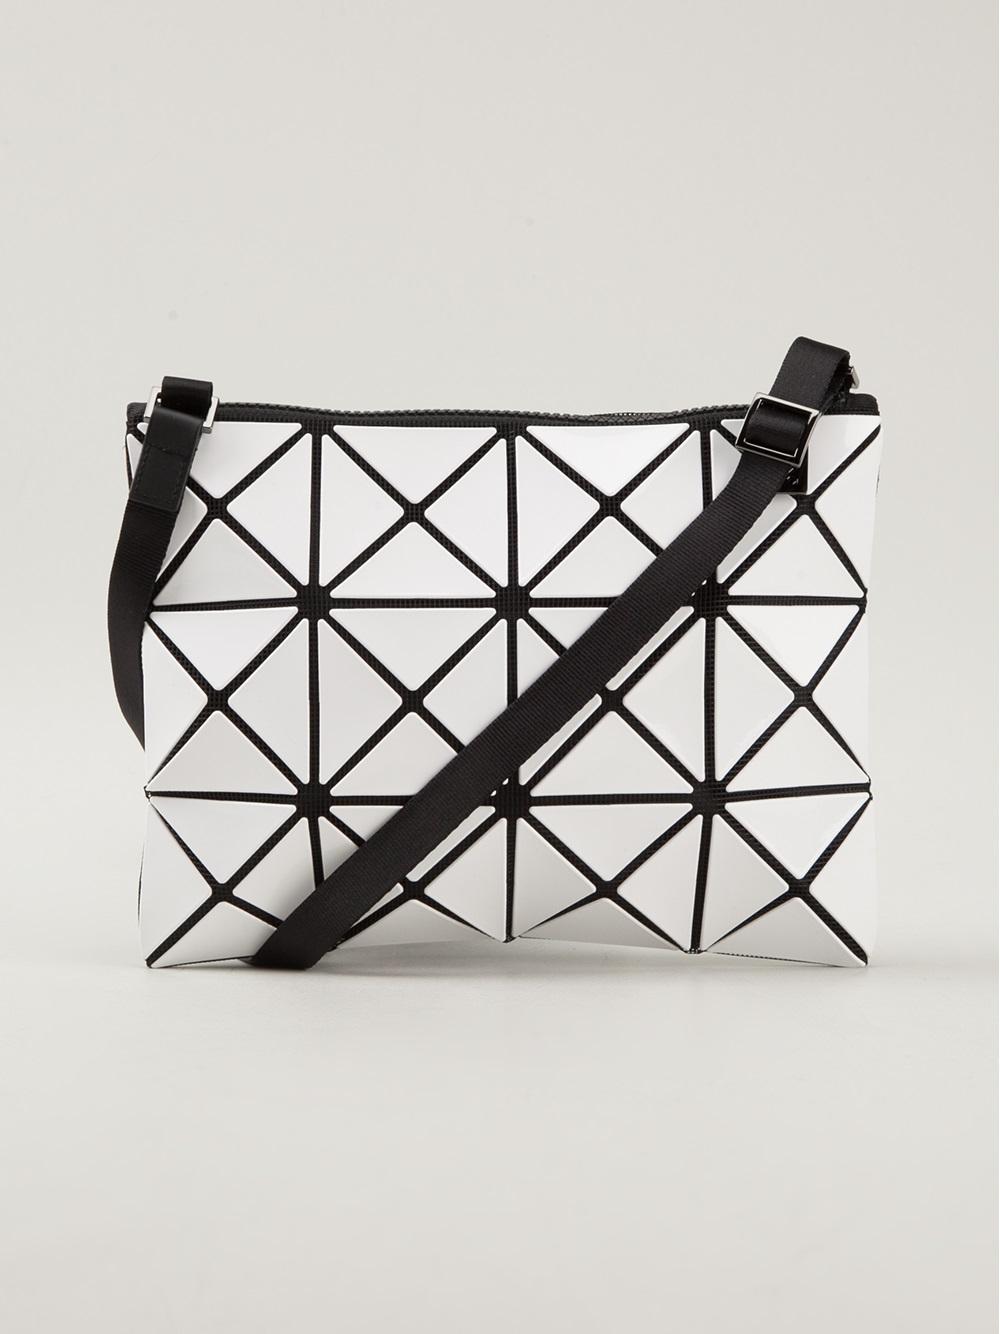 1139603c9906 Lyst - Bao Bao Issey Miyake Crossbody Bag in Black